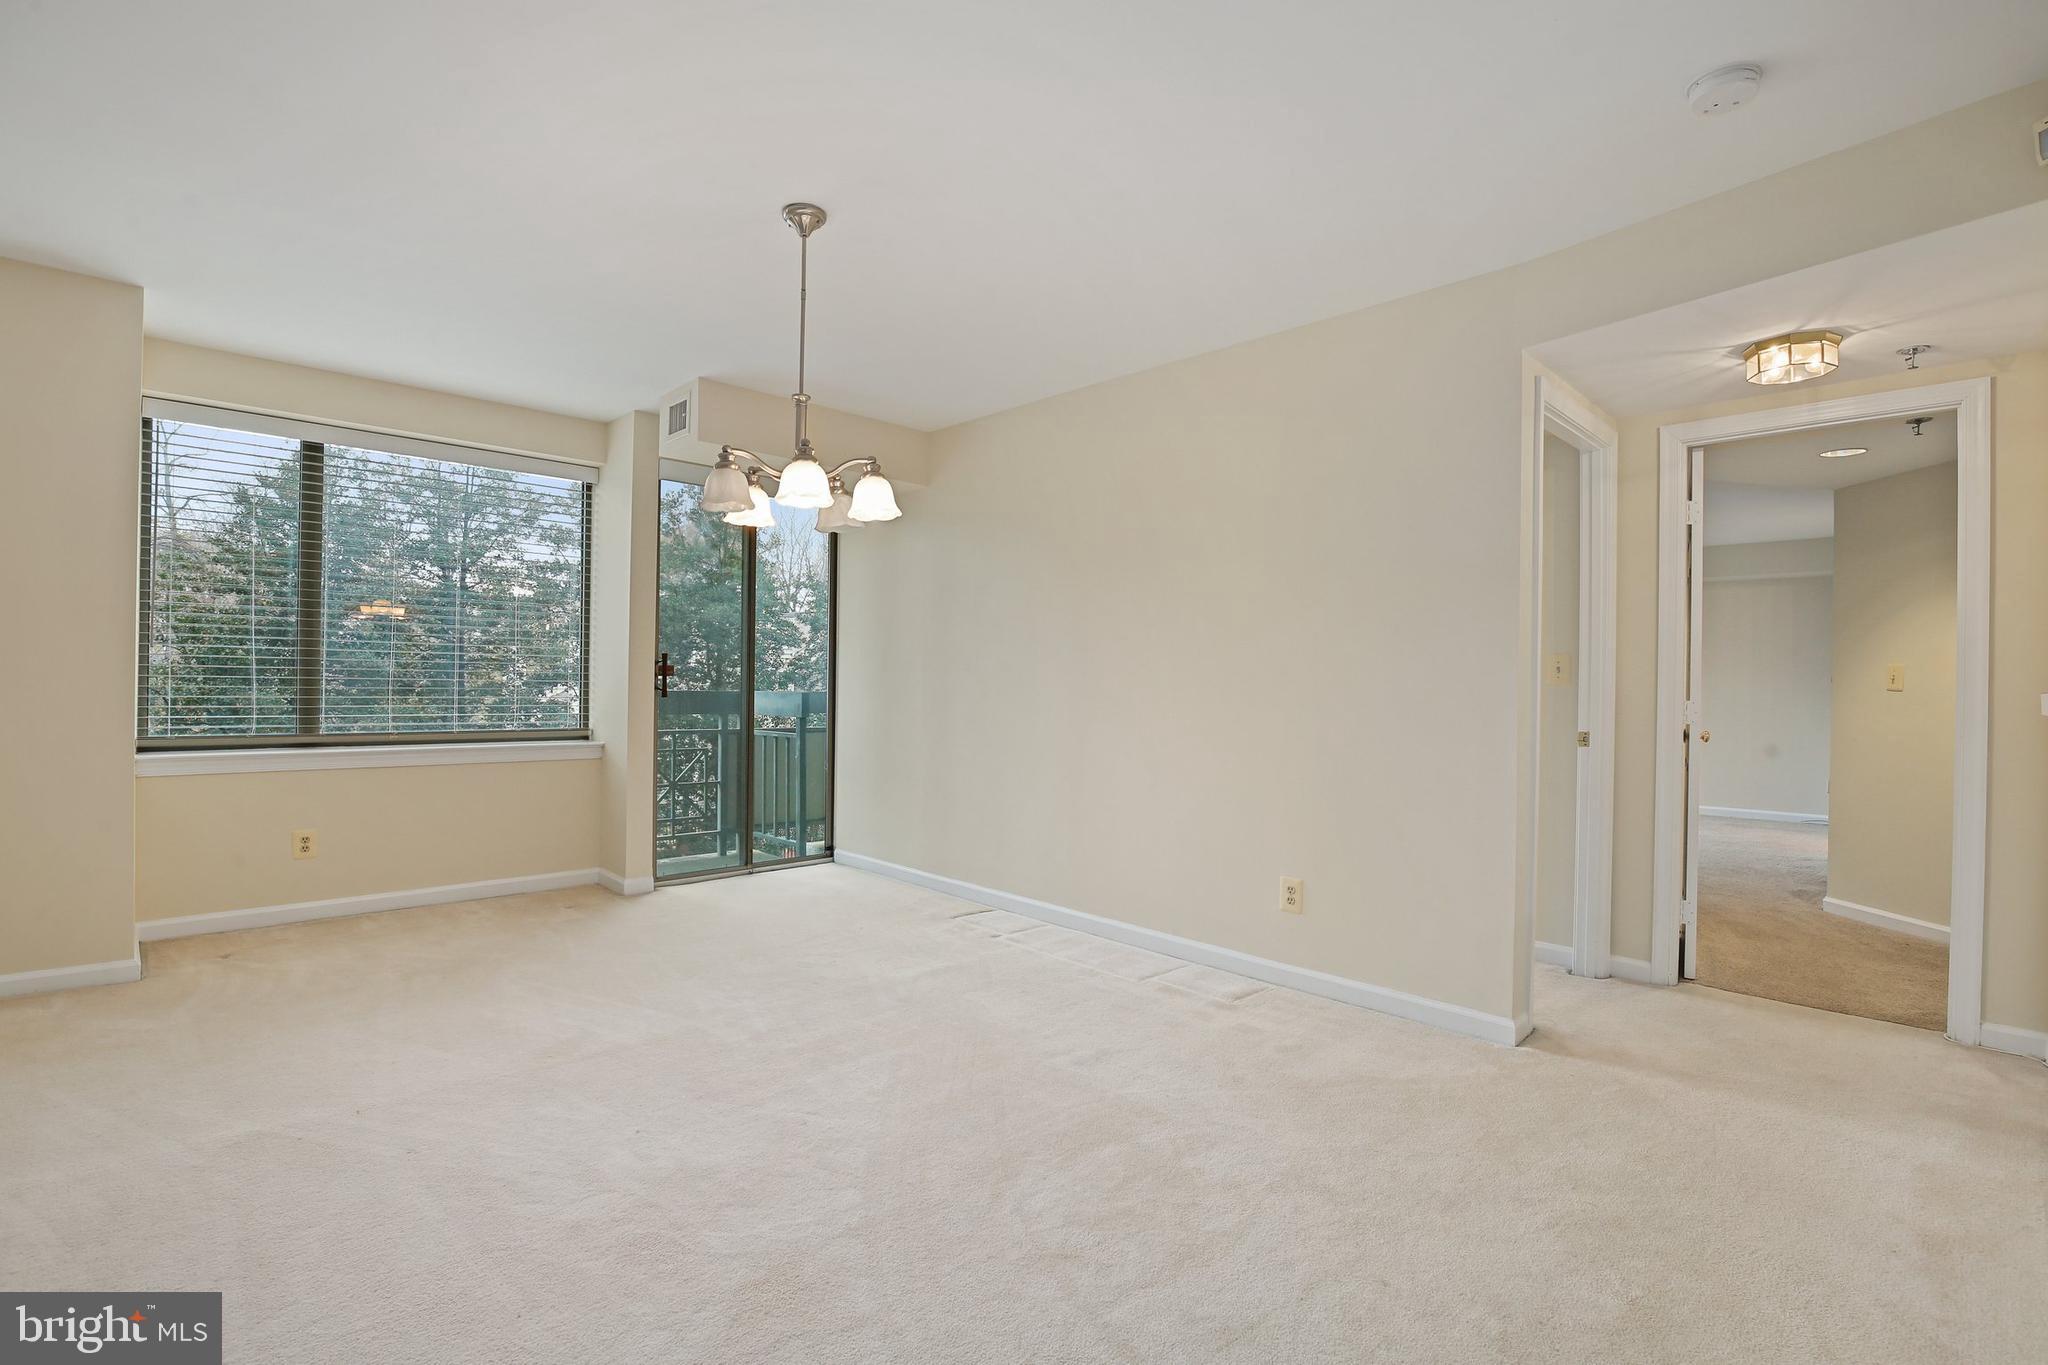 5450 WHITLEY PARK TERRACE, BETHESDA, Maryland 20814, 2 Bedrooms Bedrooms, ,2 BathroomsBathrooms,Condominium,For Sale,5450 WHITLEY PARK TERRACE,MDMC734392